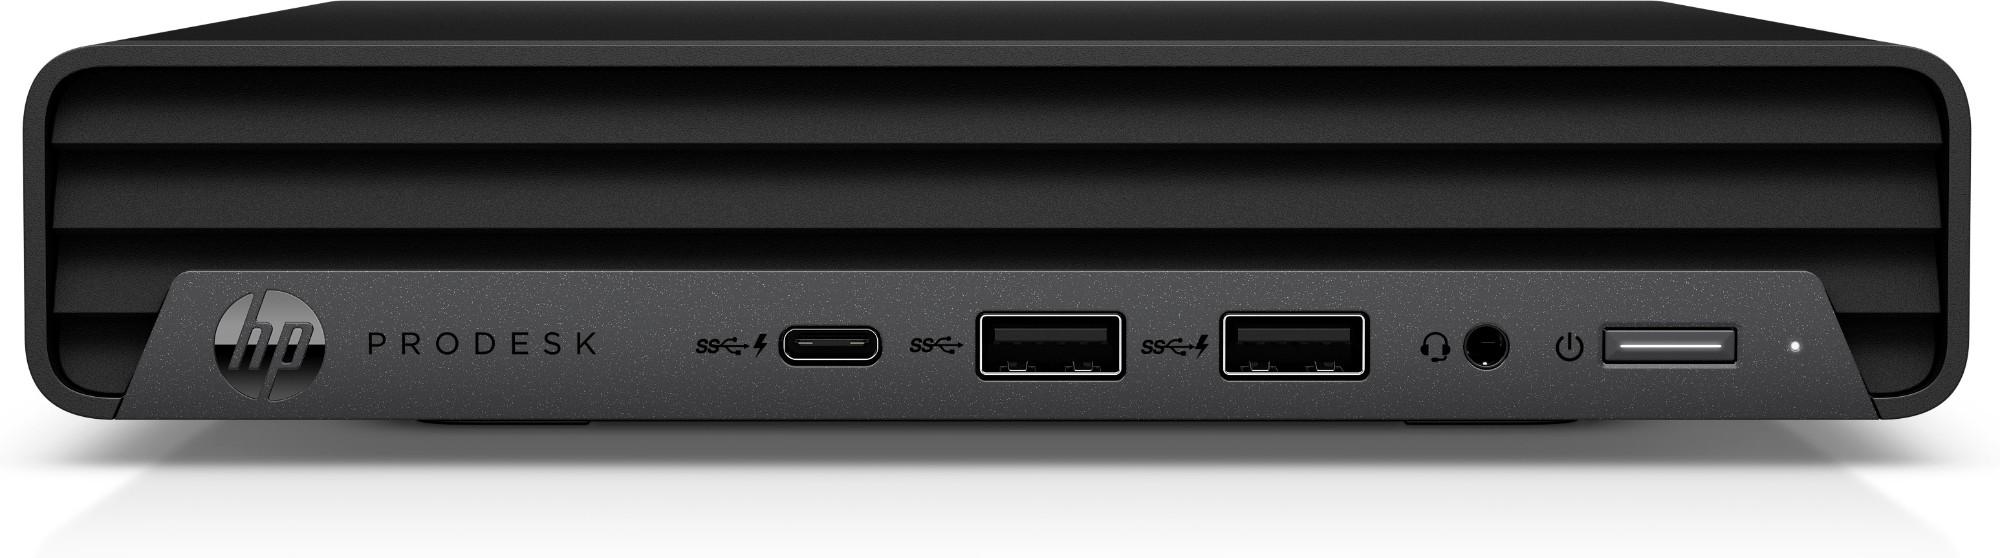 HP ProDesk 400 G6 Intel® Core™ i5 de 10ma Generación i5-10500T 16 GB DDR4-SDRAM 512 GB SSD mini PC Negro Windows 10 Pro